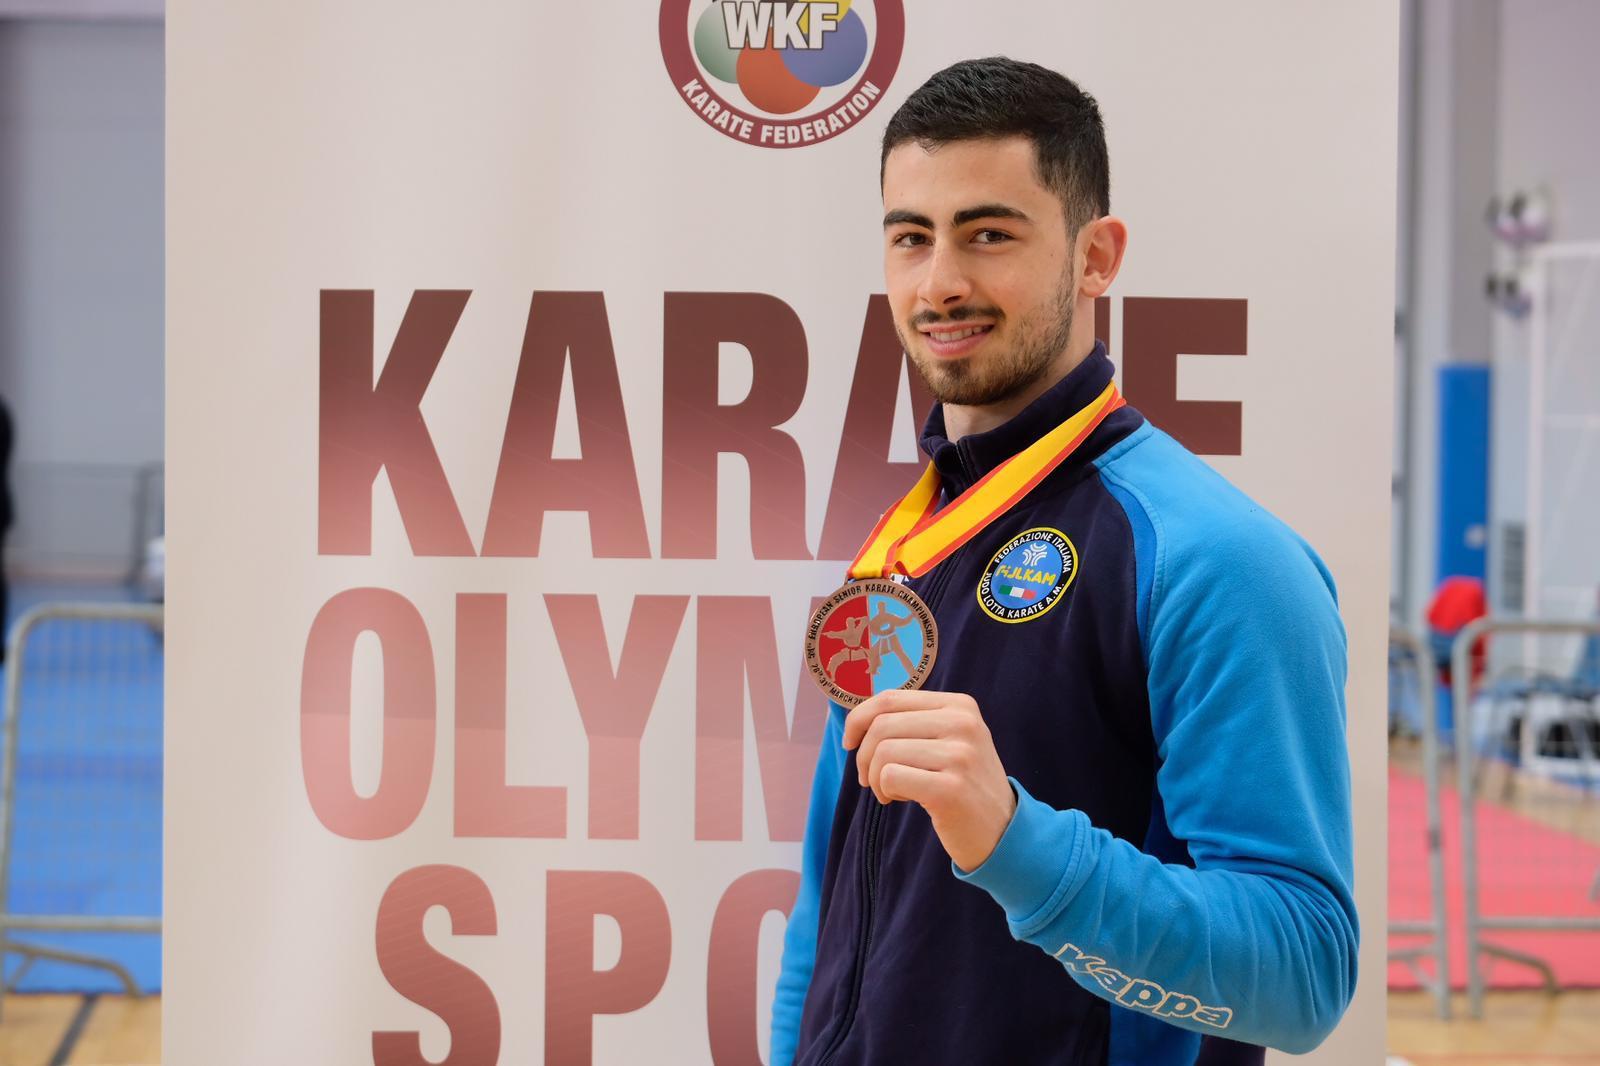 Karate, il vittoriese Giuseppe Panagia bronzo agli Europei di Guadalajara in Spagna